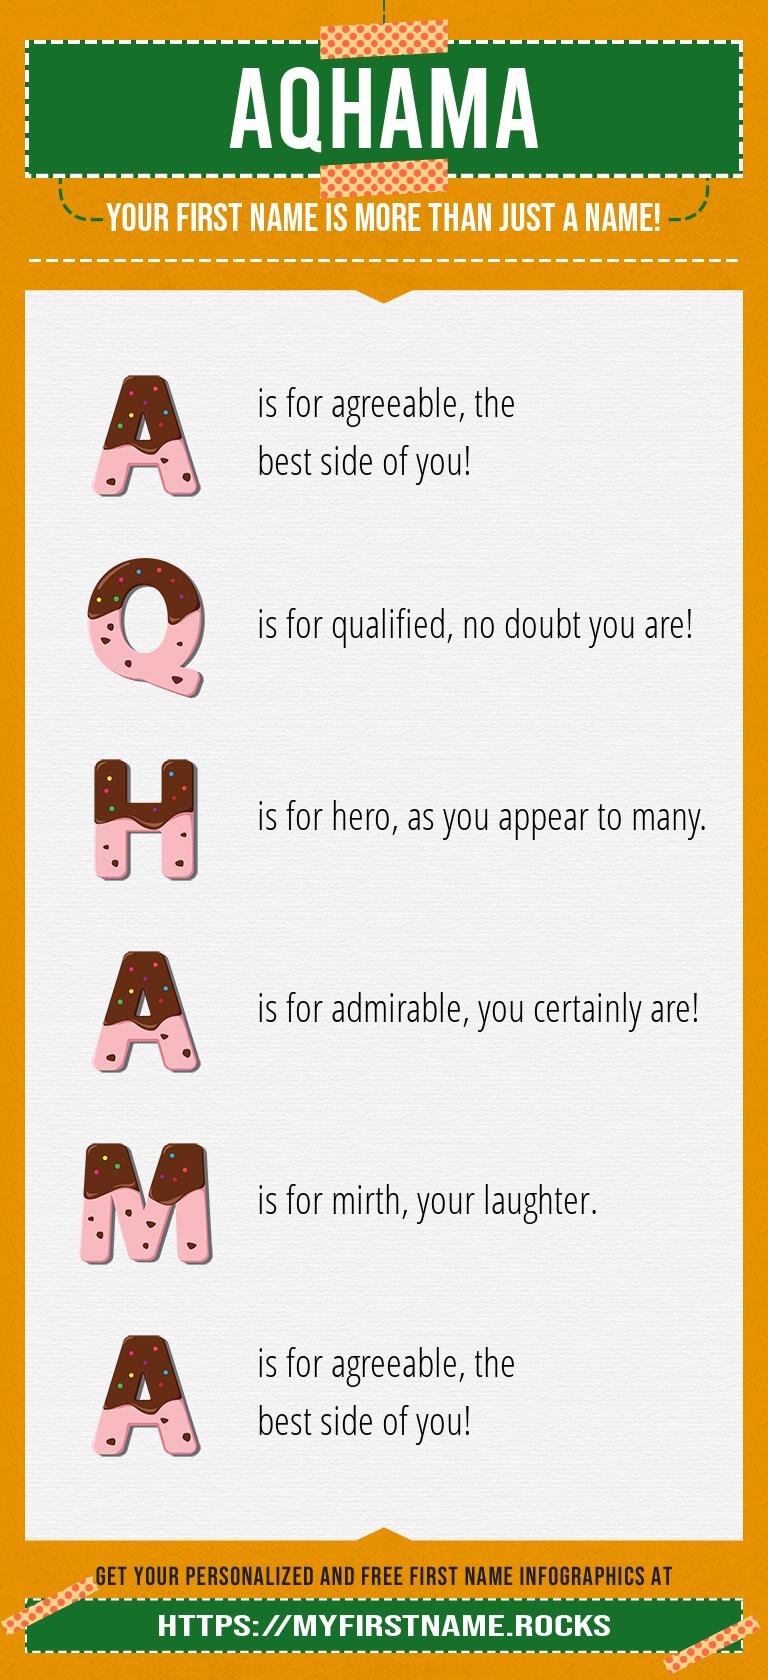 Aqhama Infographics